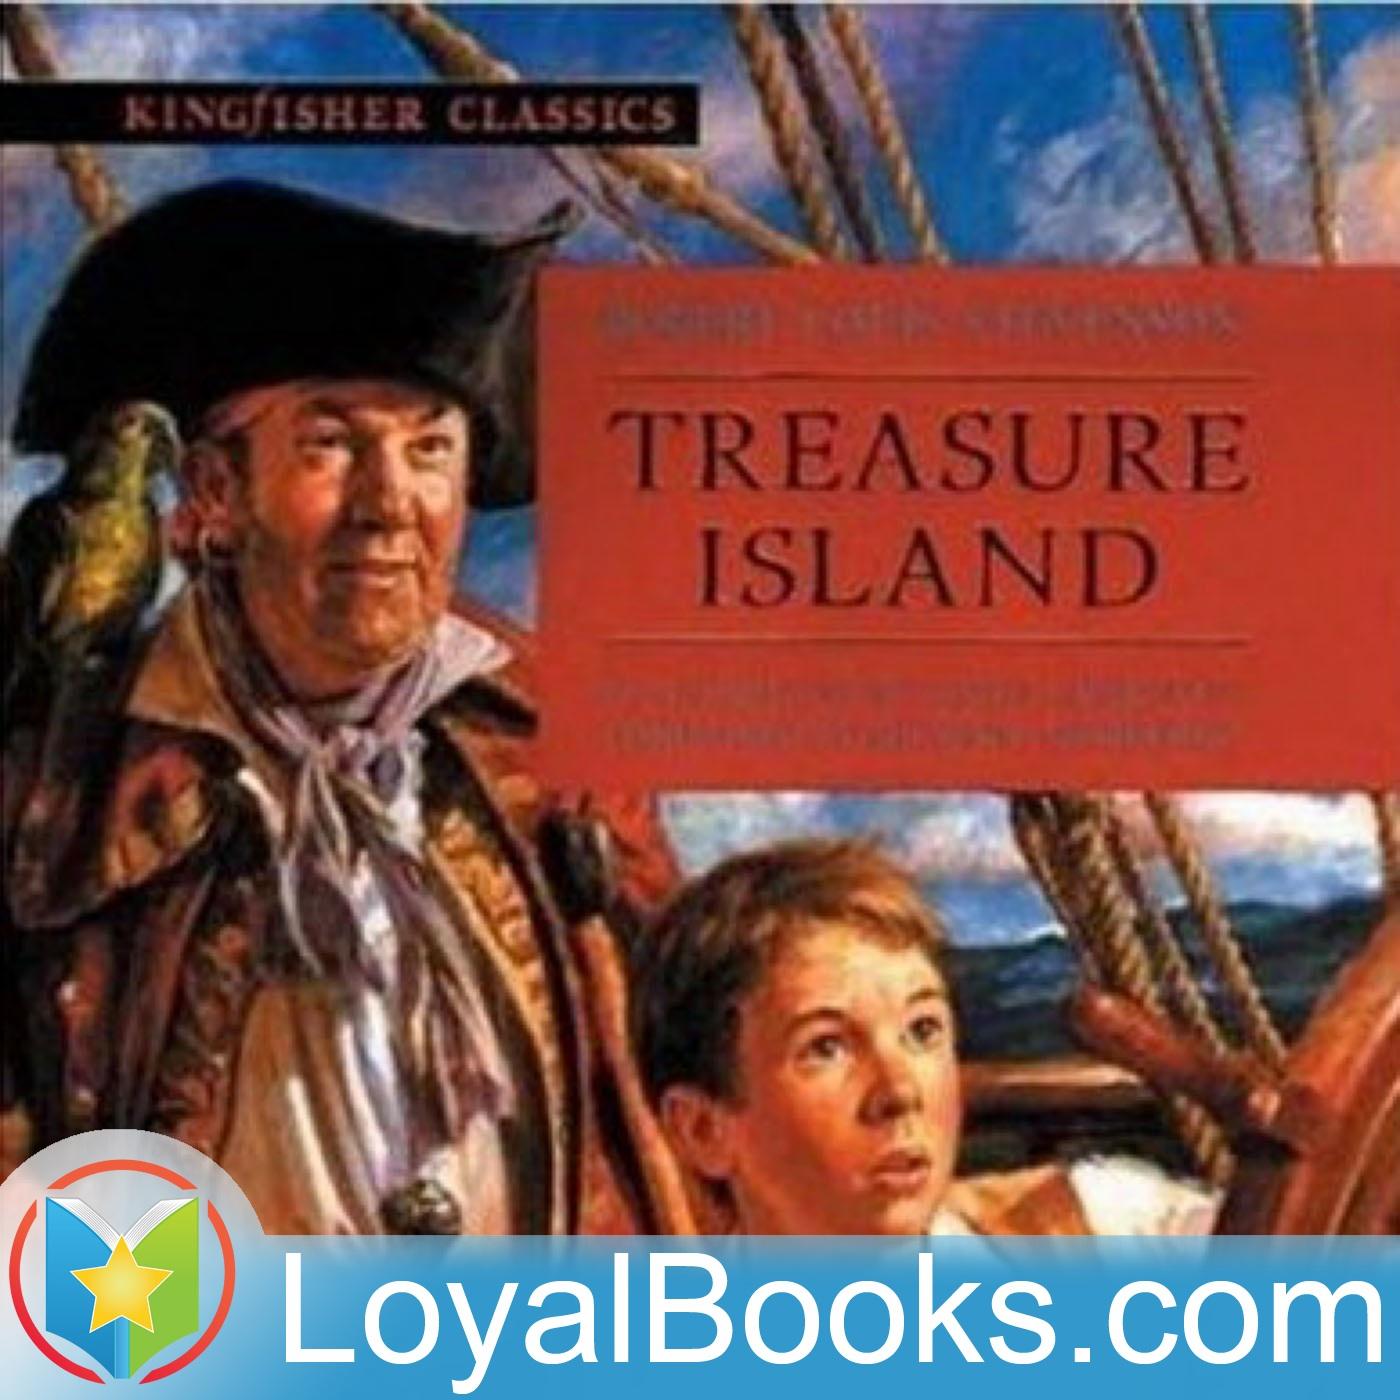 <![CDATA[Treasure Island by Robert Louis Stevenson]]>